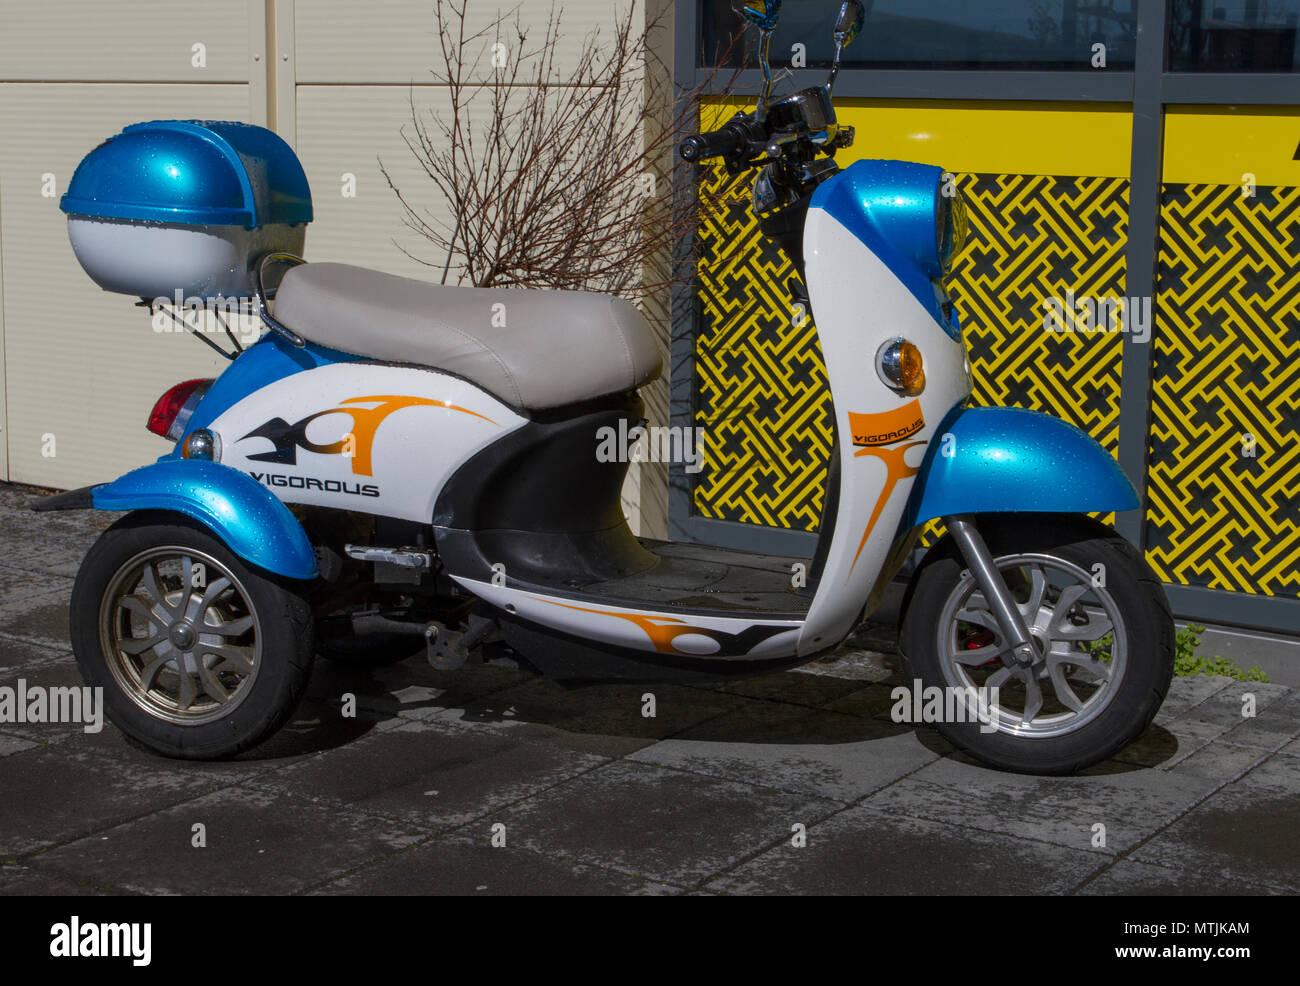 Vigorous Scooter, in Selfoss Iceland. - Stock Image